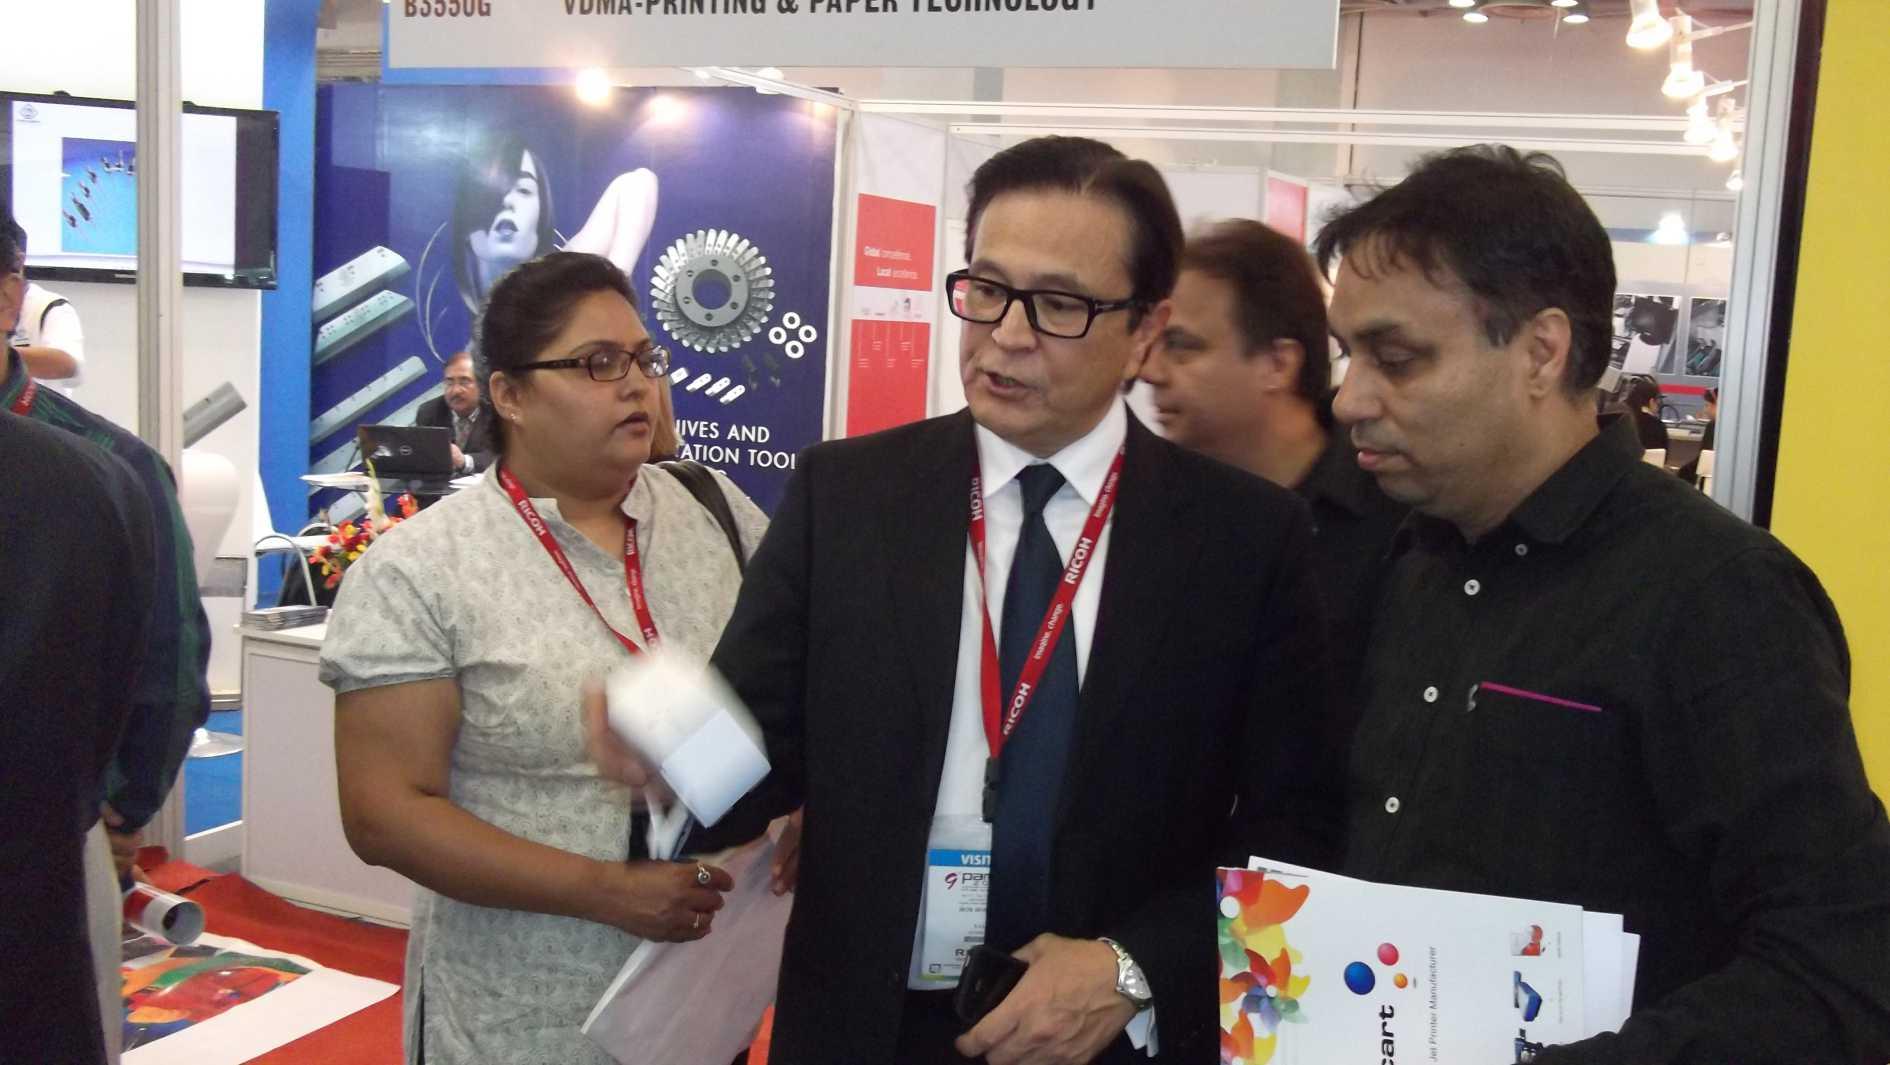 Digital Inkjet Printing Machine Manufacturer India